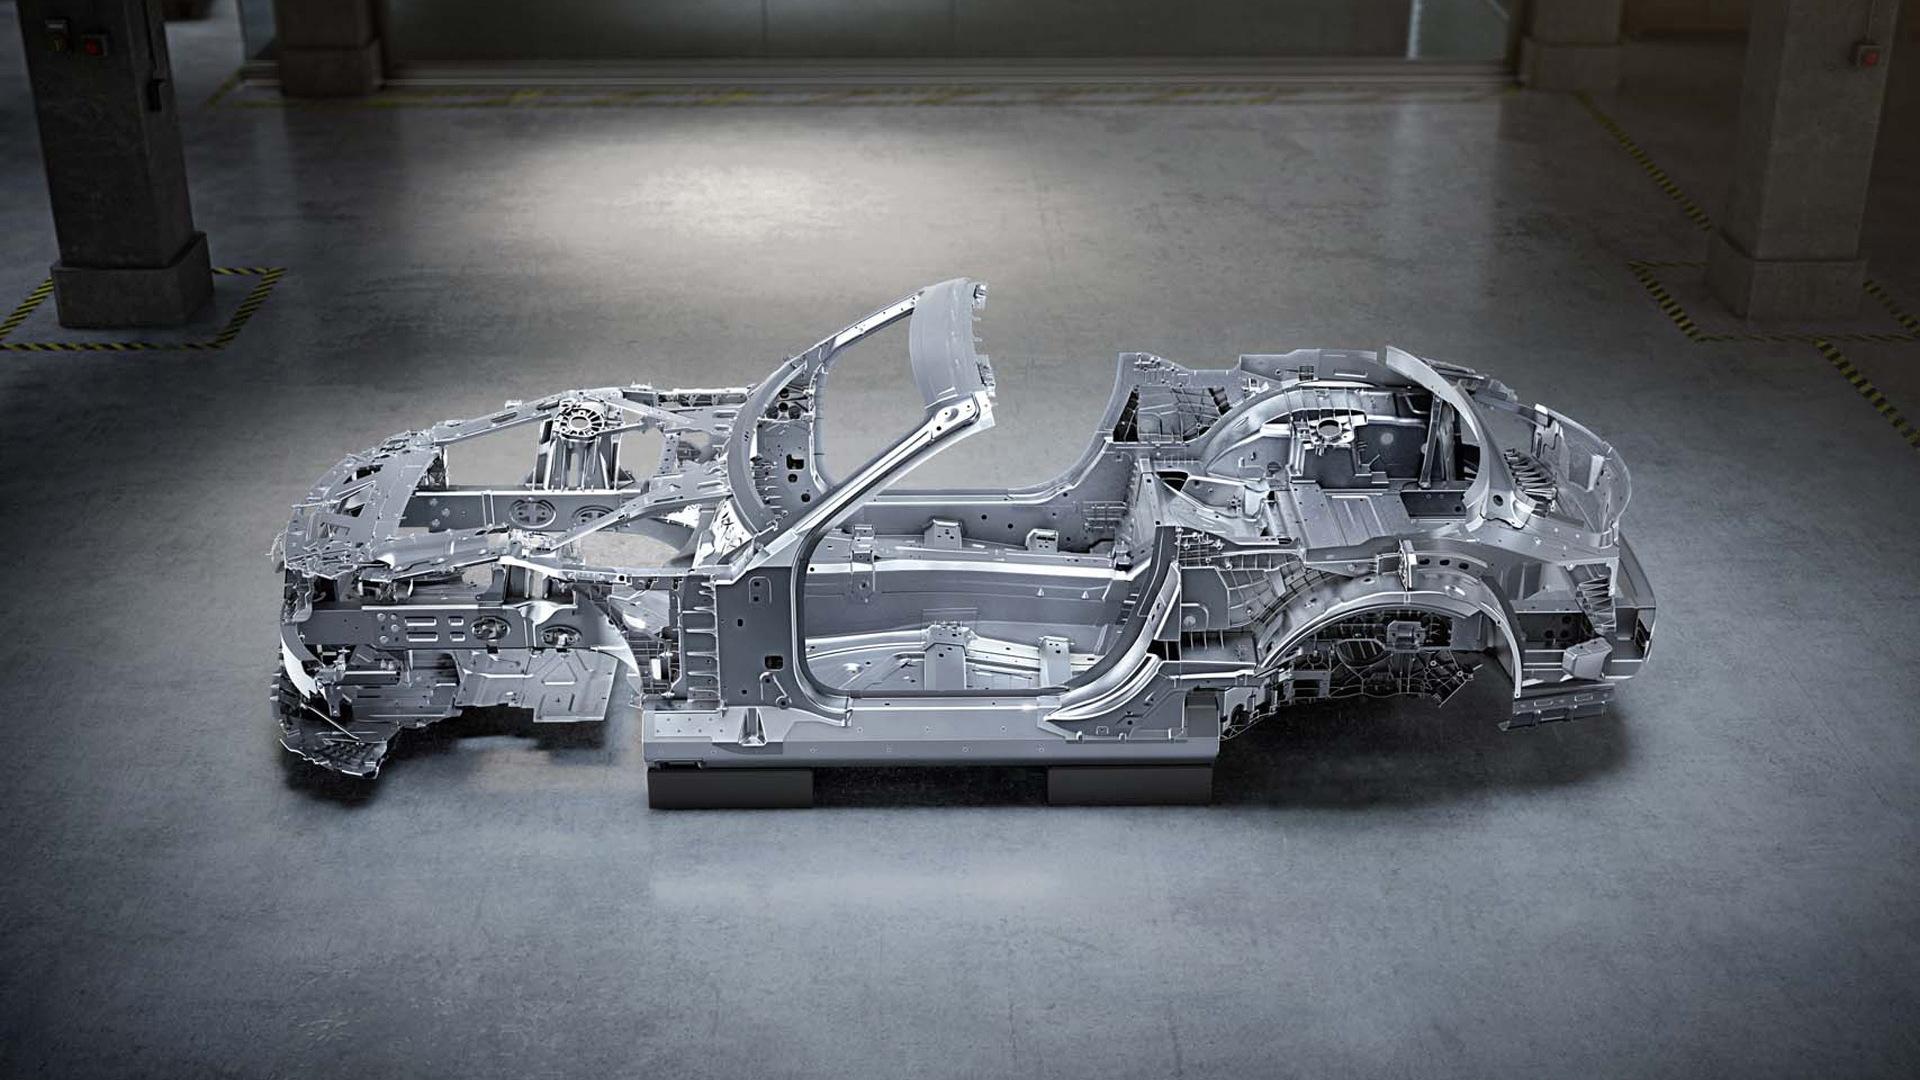 2022 Mercedes-Benz AMG SL Roadster body shell